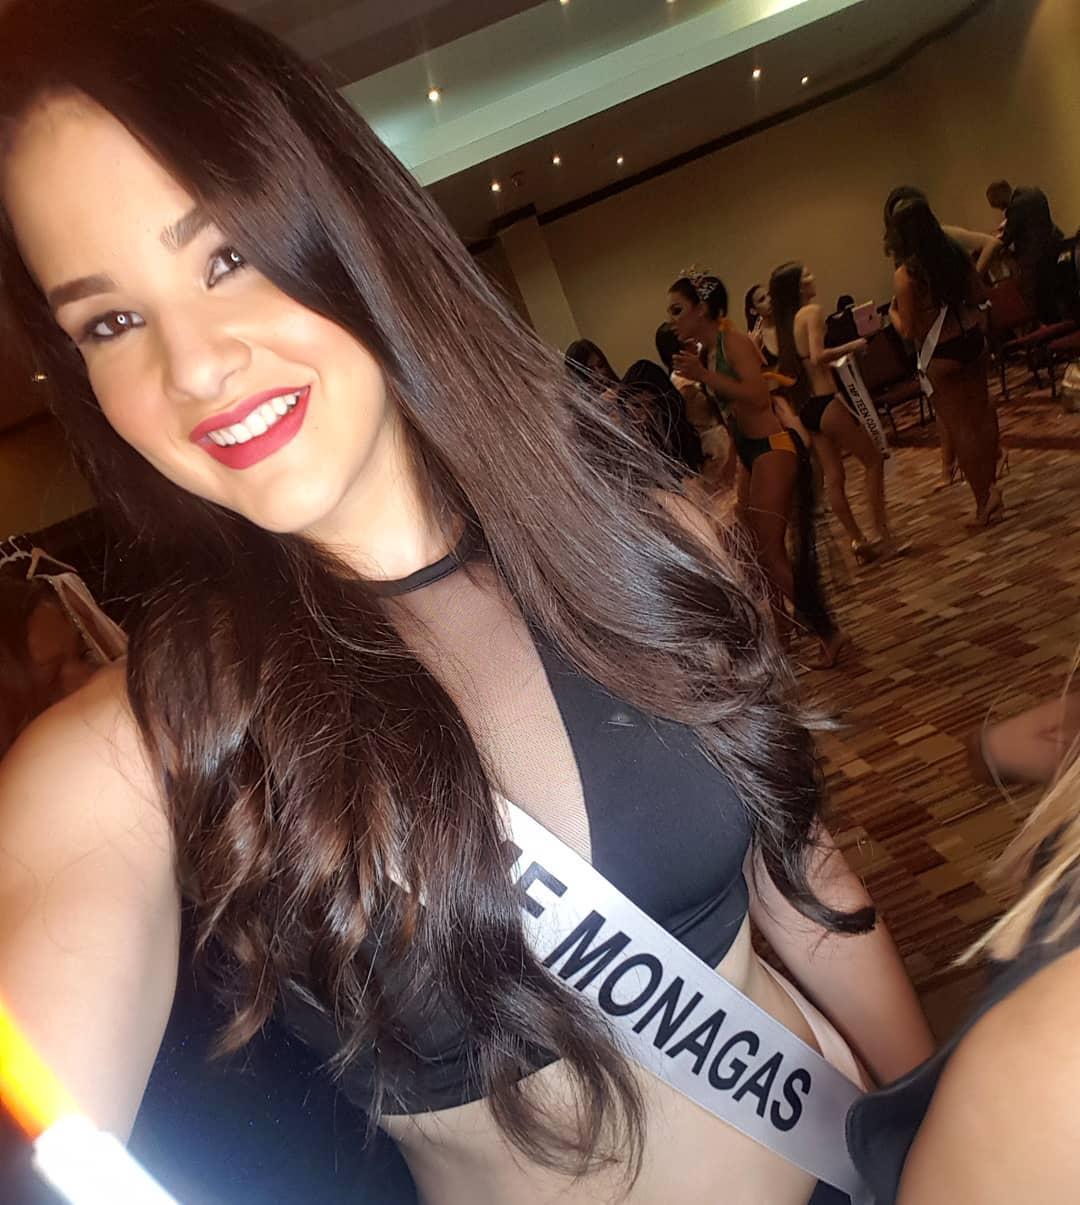 daniela di venere, top 12 de miss teen mundial 2019. - Página 2 37057910